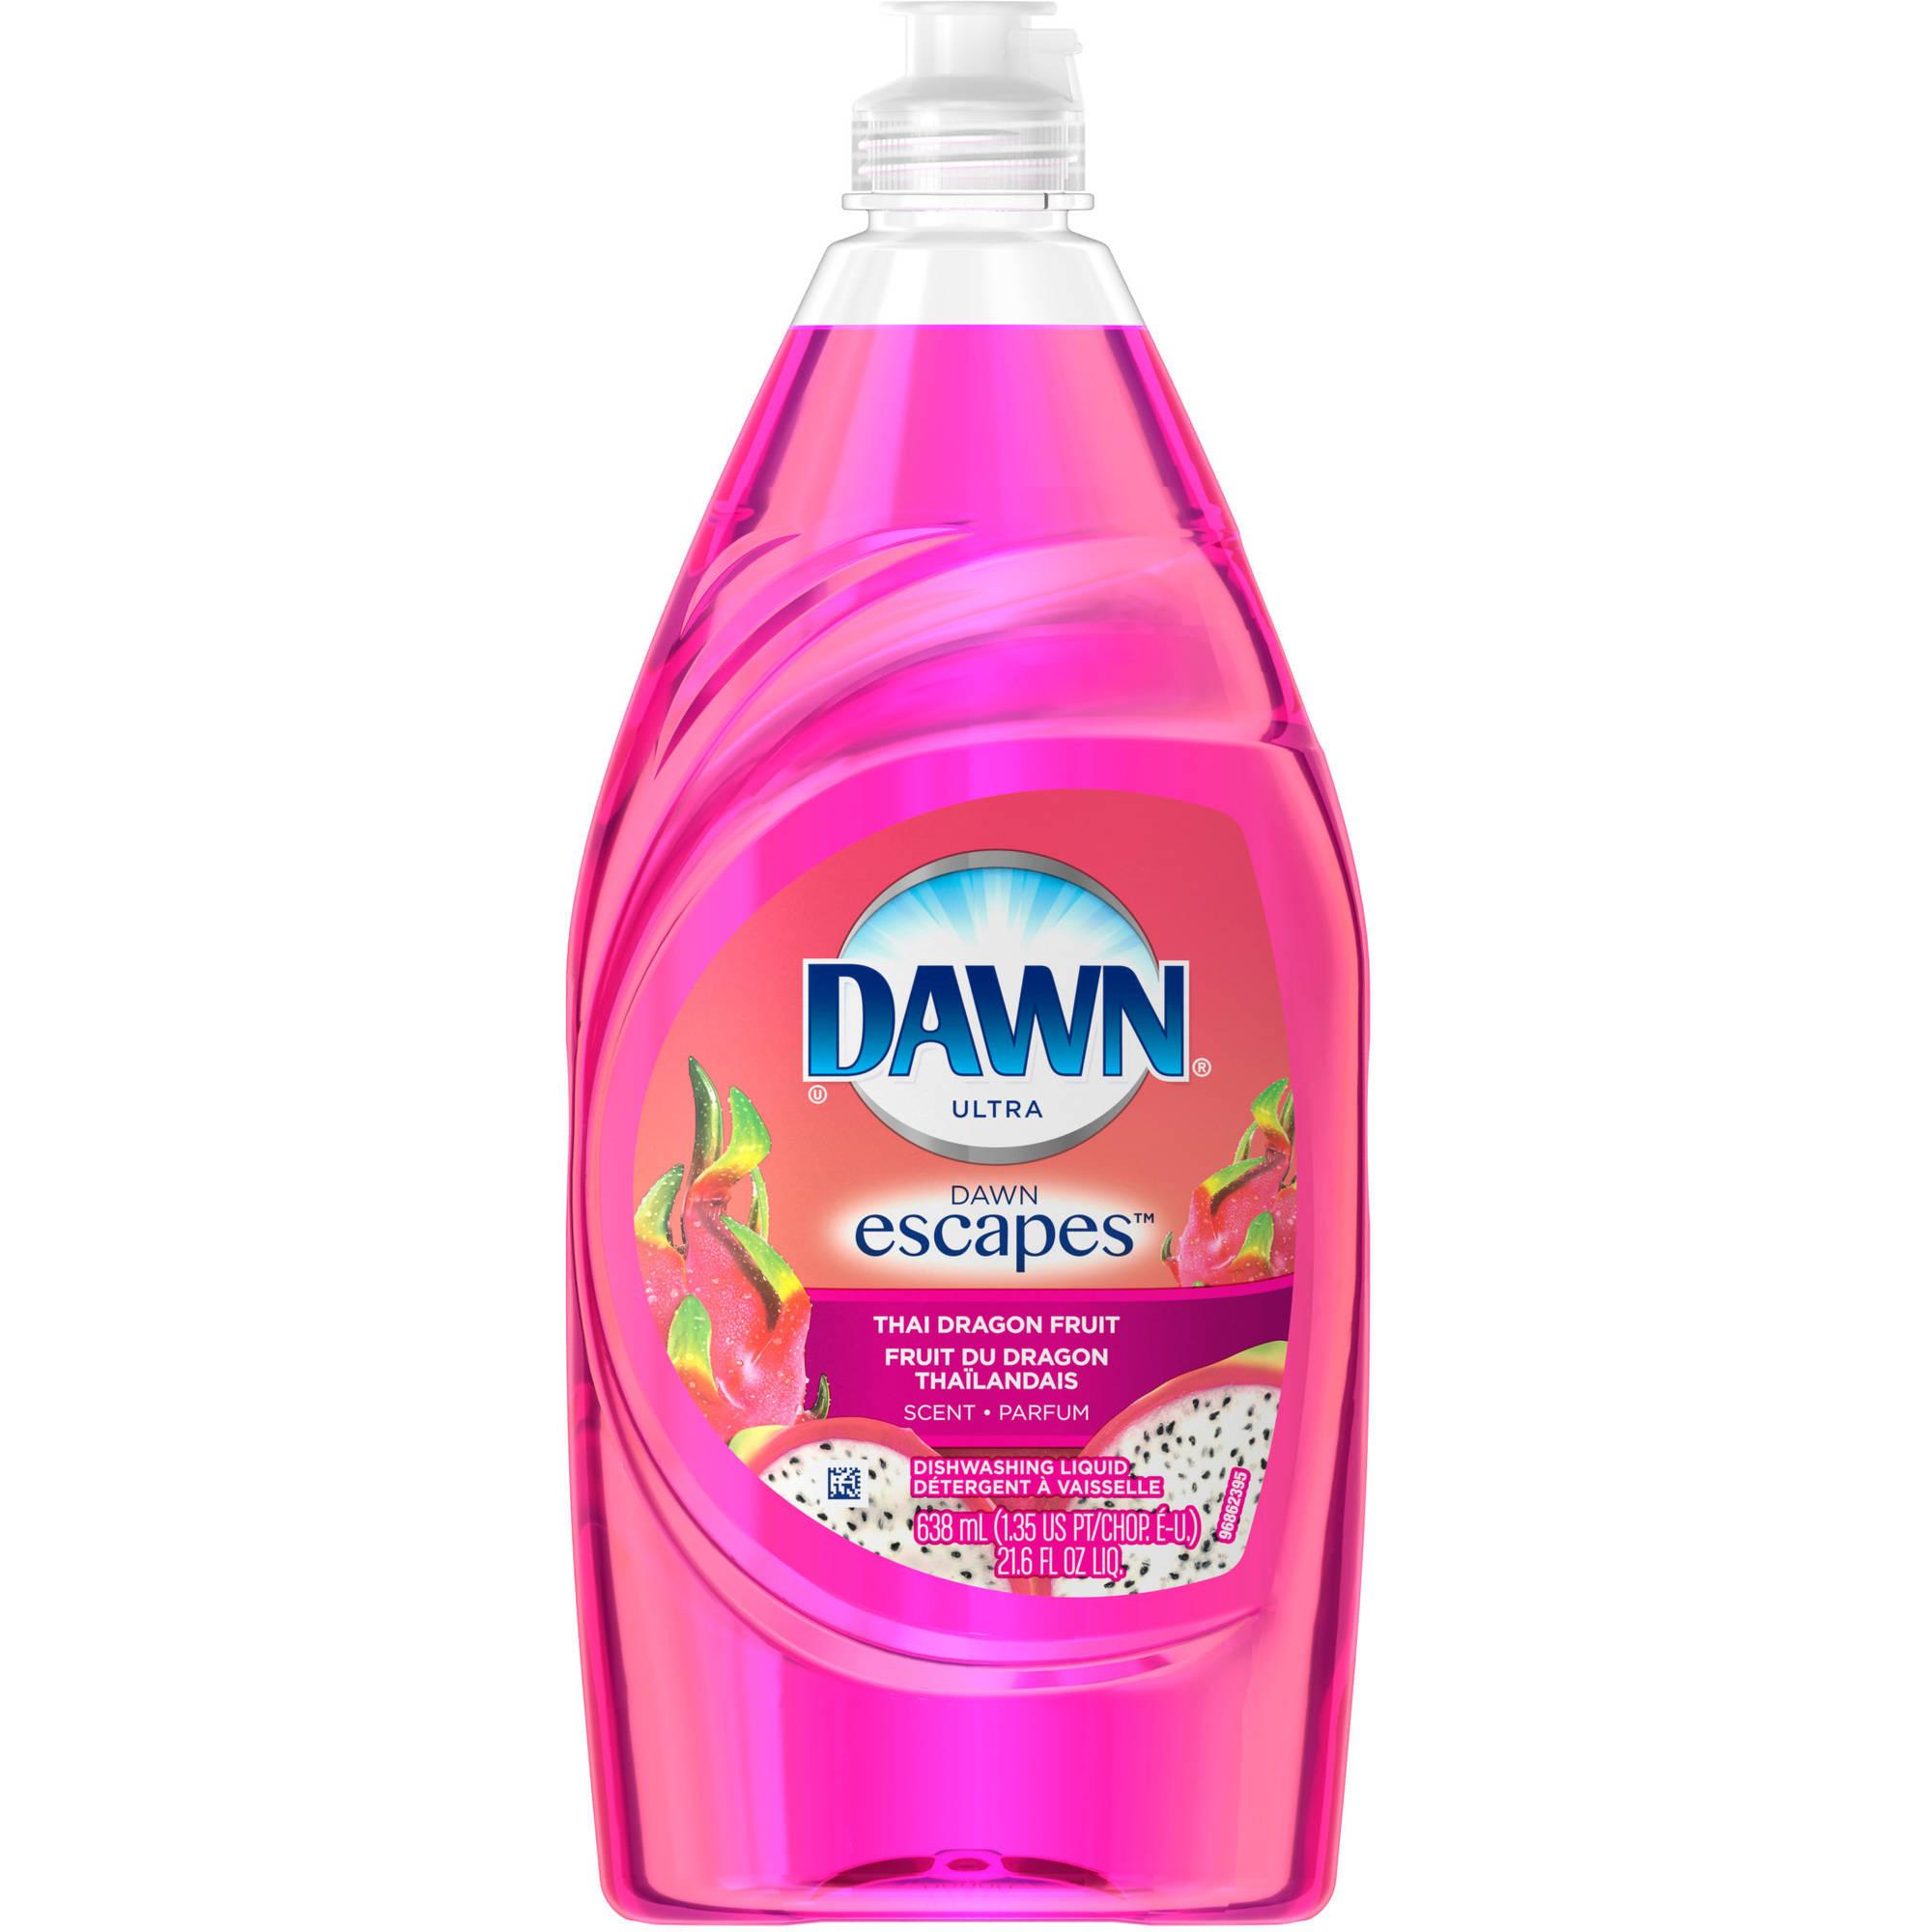 Dawn Escapes Dishwashing Liquid Thai Dragon Fruit